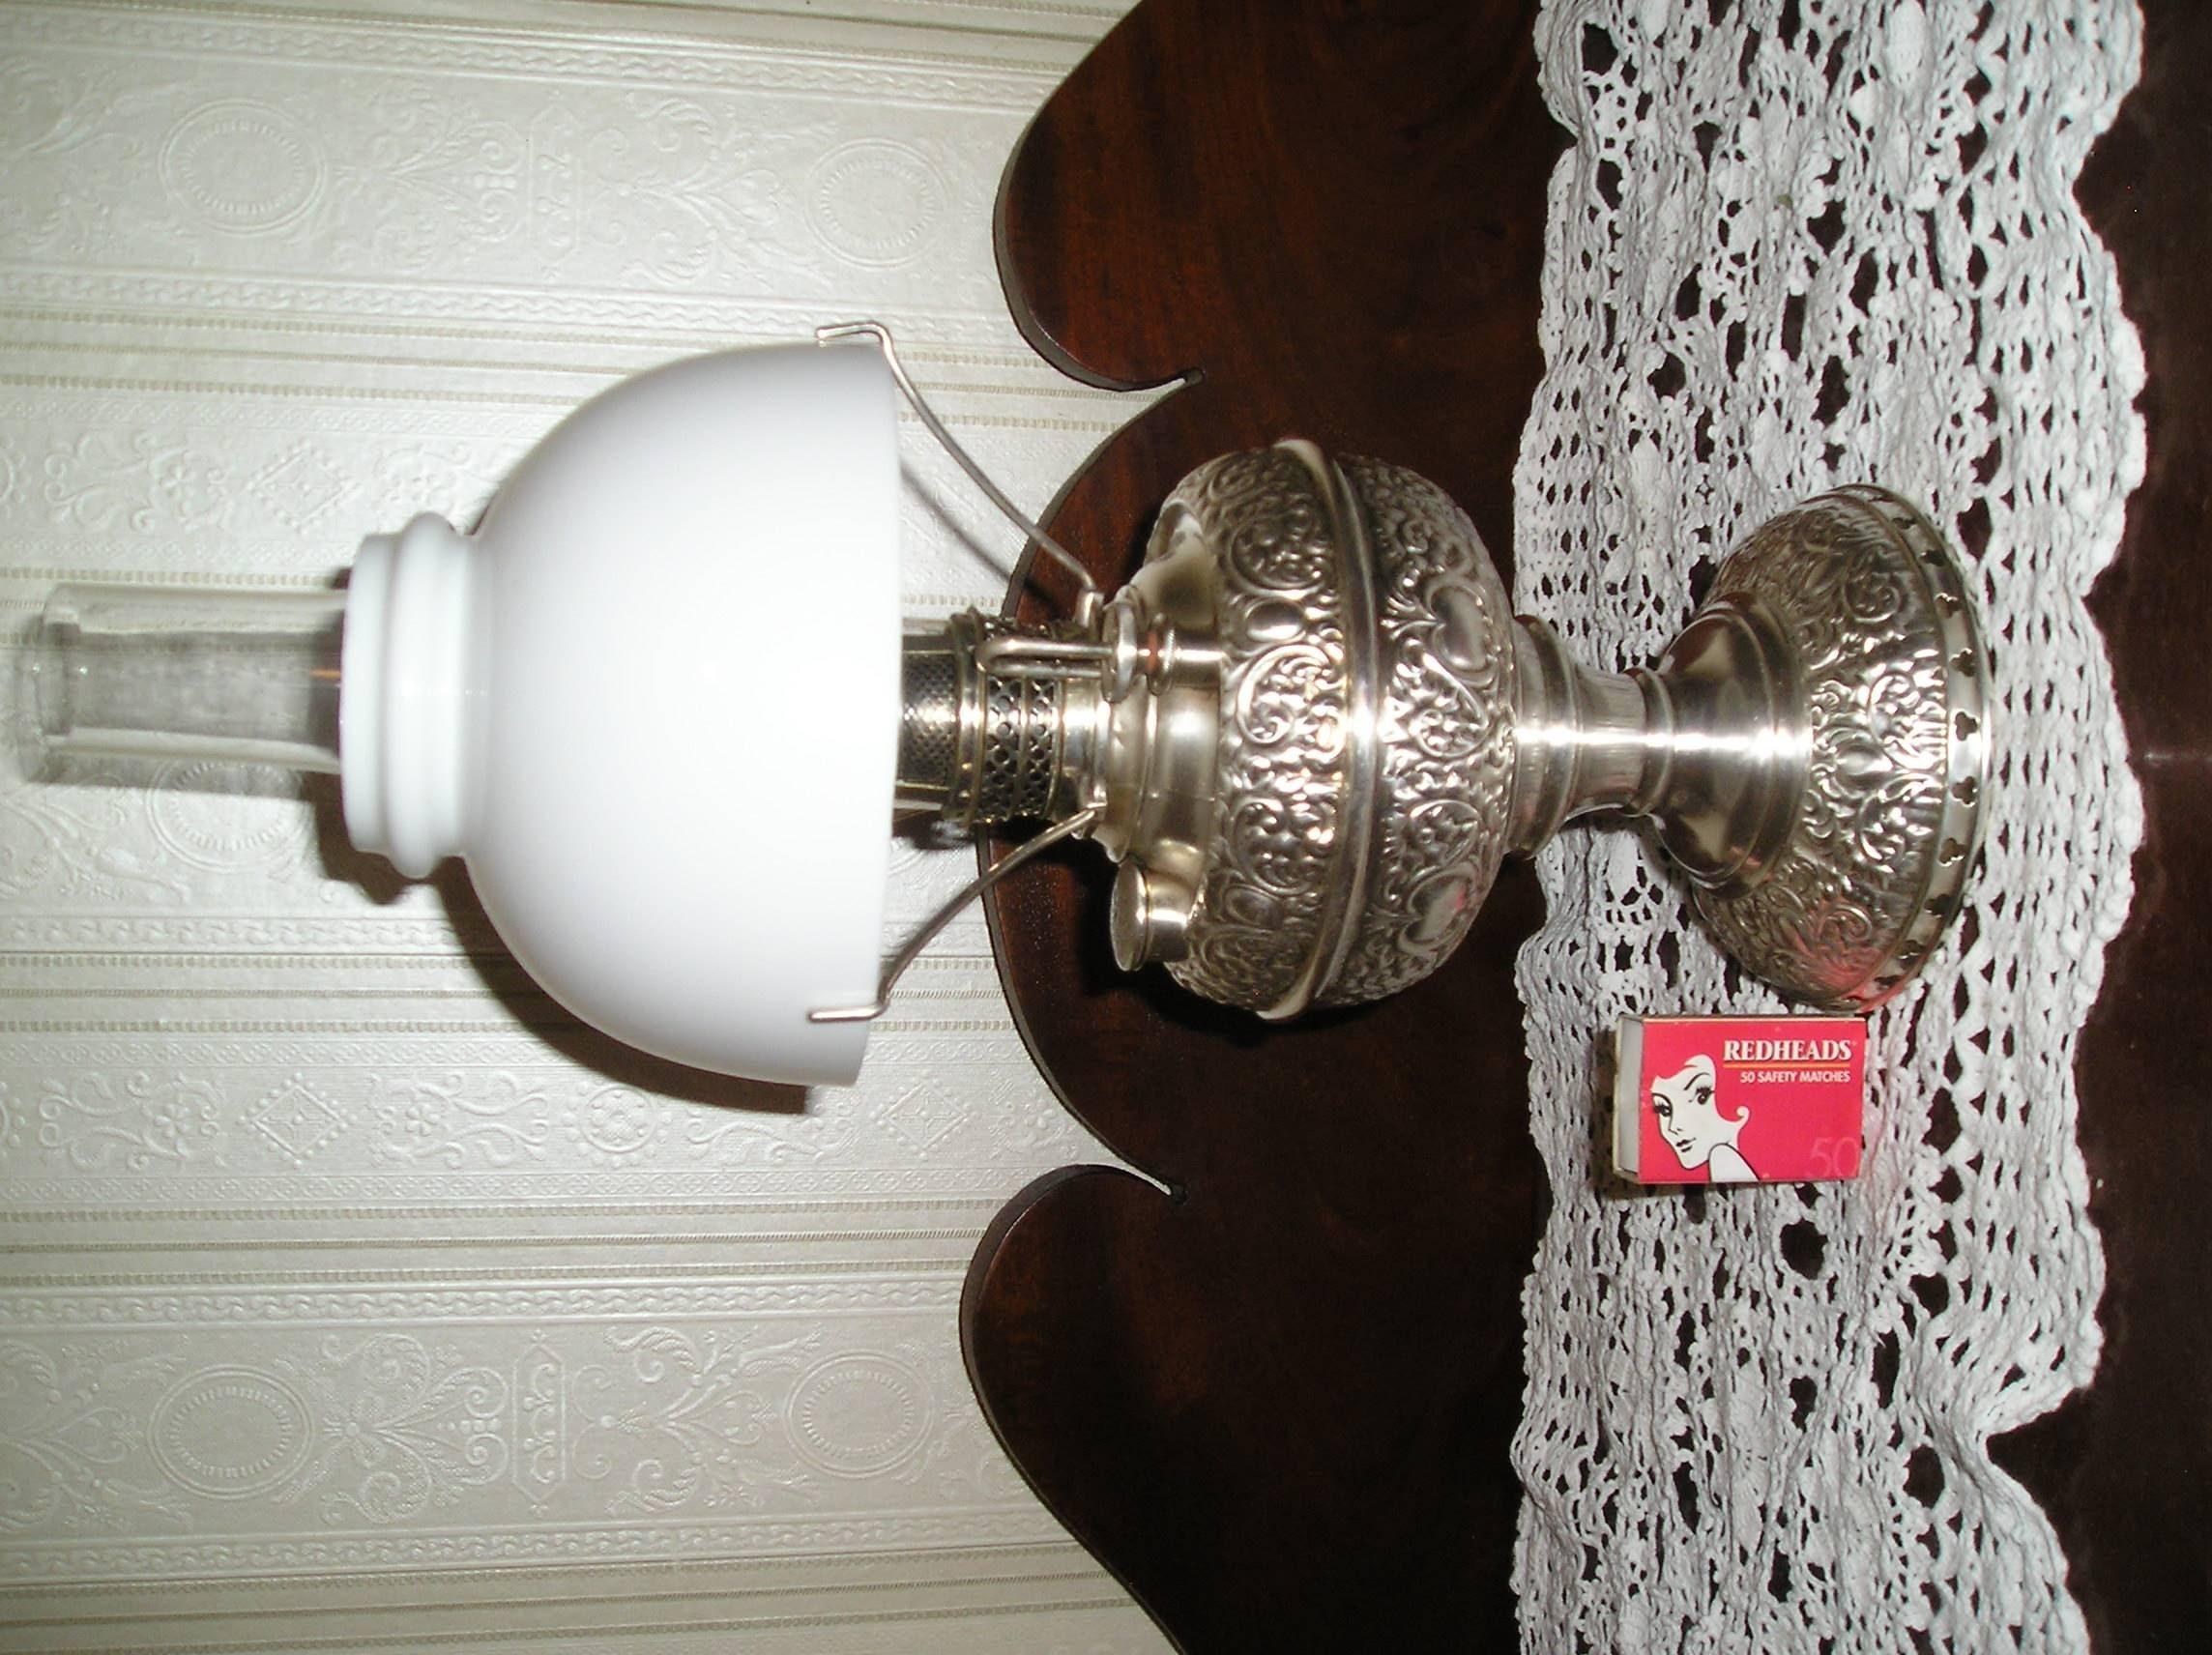 Bathroom Lighting Made In Usa millertablelamps - edward miller & company of meriden, conneticuit usa